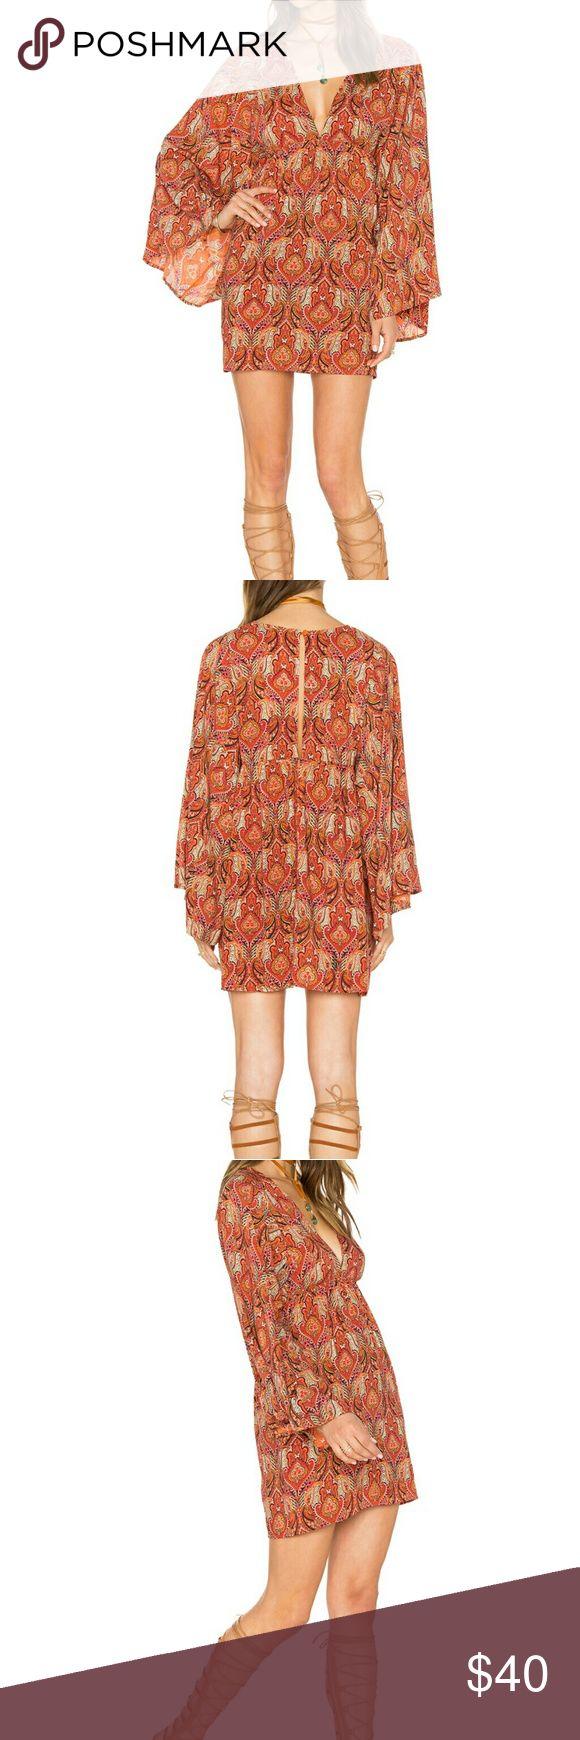 boho dress beautifully colored boho dress - great for spring and upcoming festivals! hotel Dresses Mini